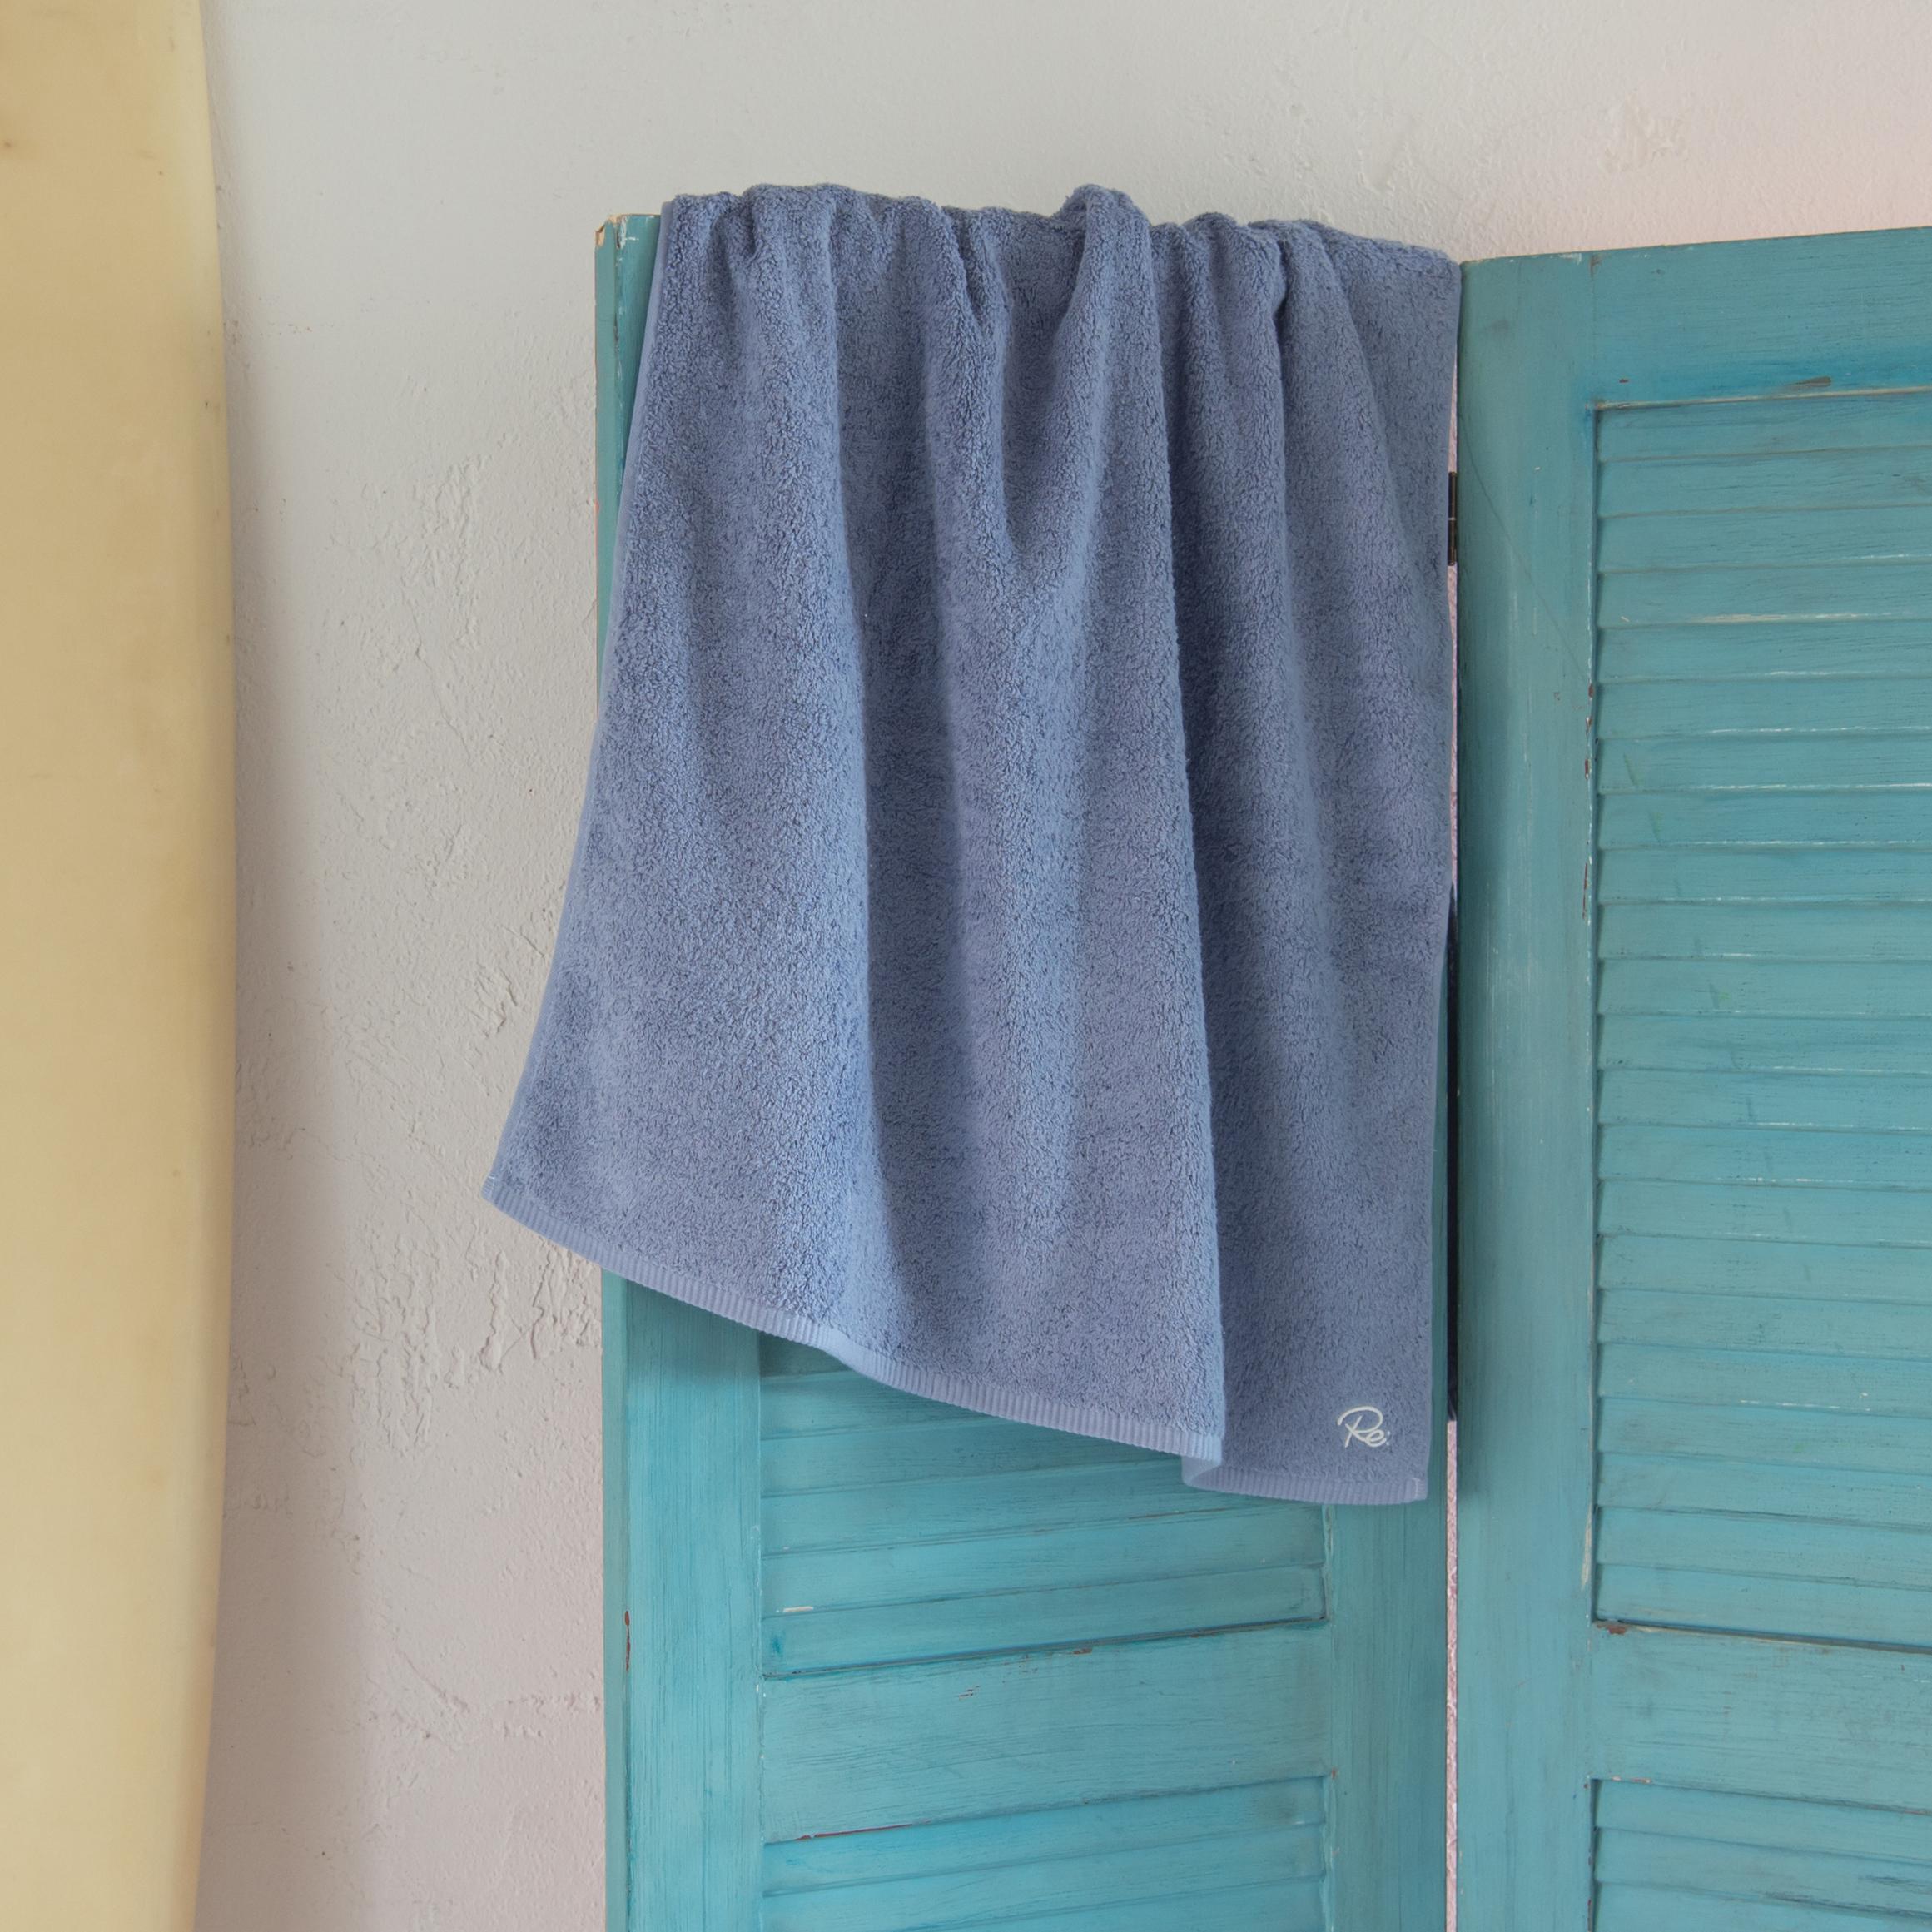 Re LOGO BATH TOWEL[REG010]